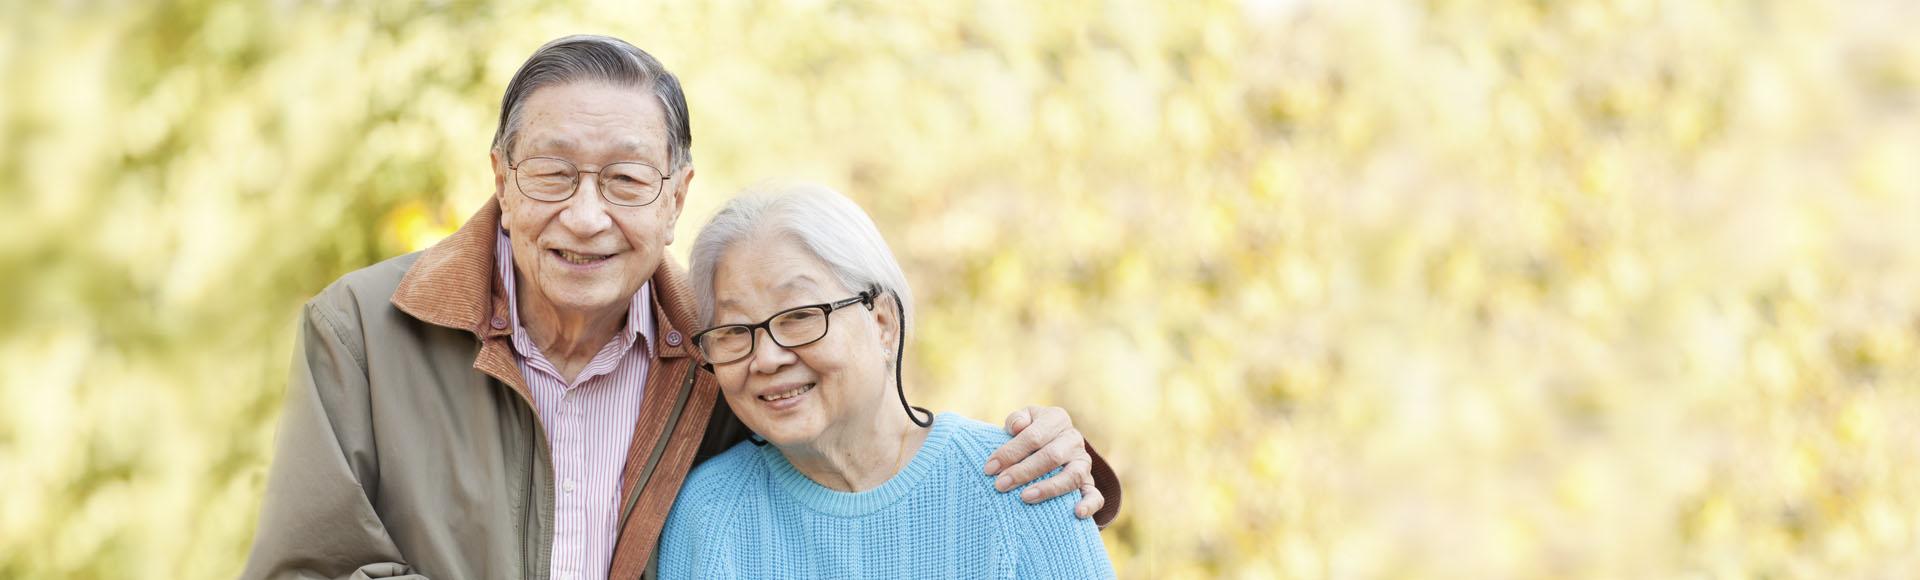 Detring Home Healthcare - Help You Need Slider